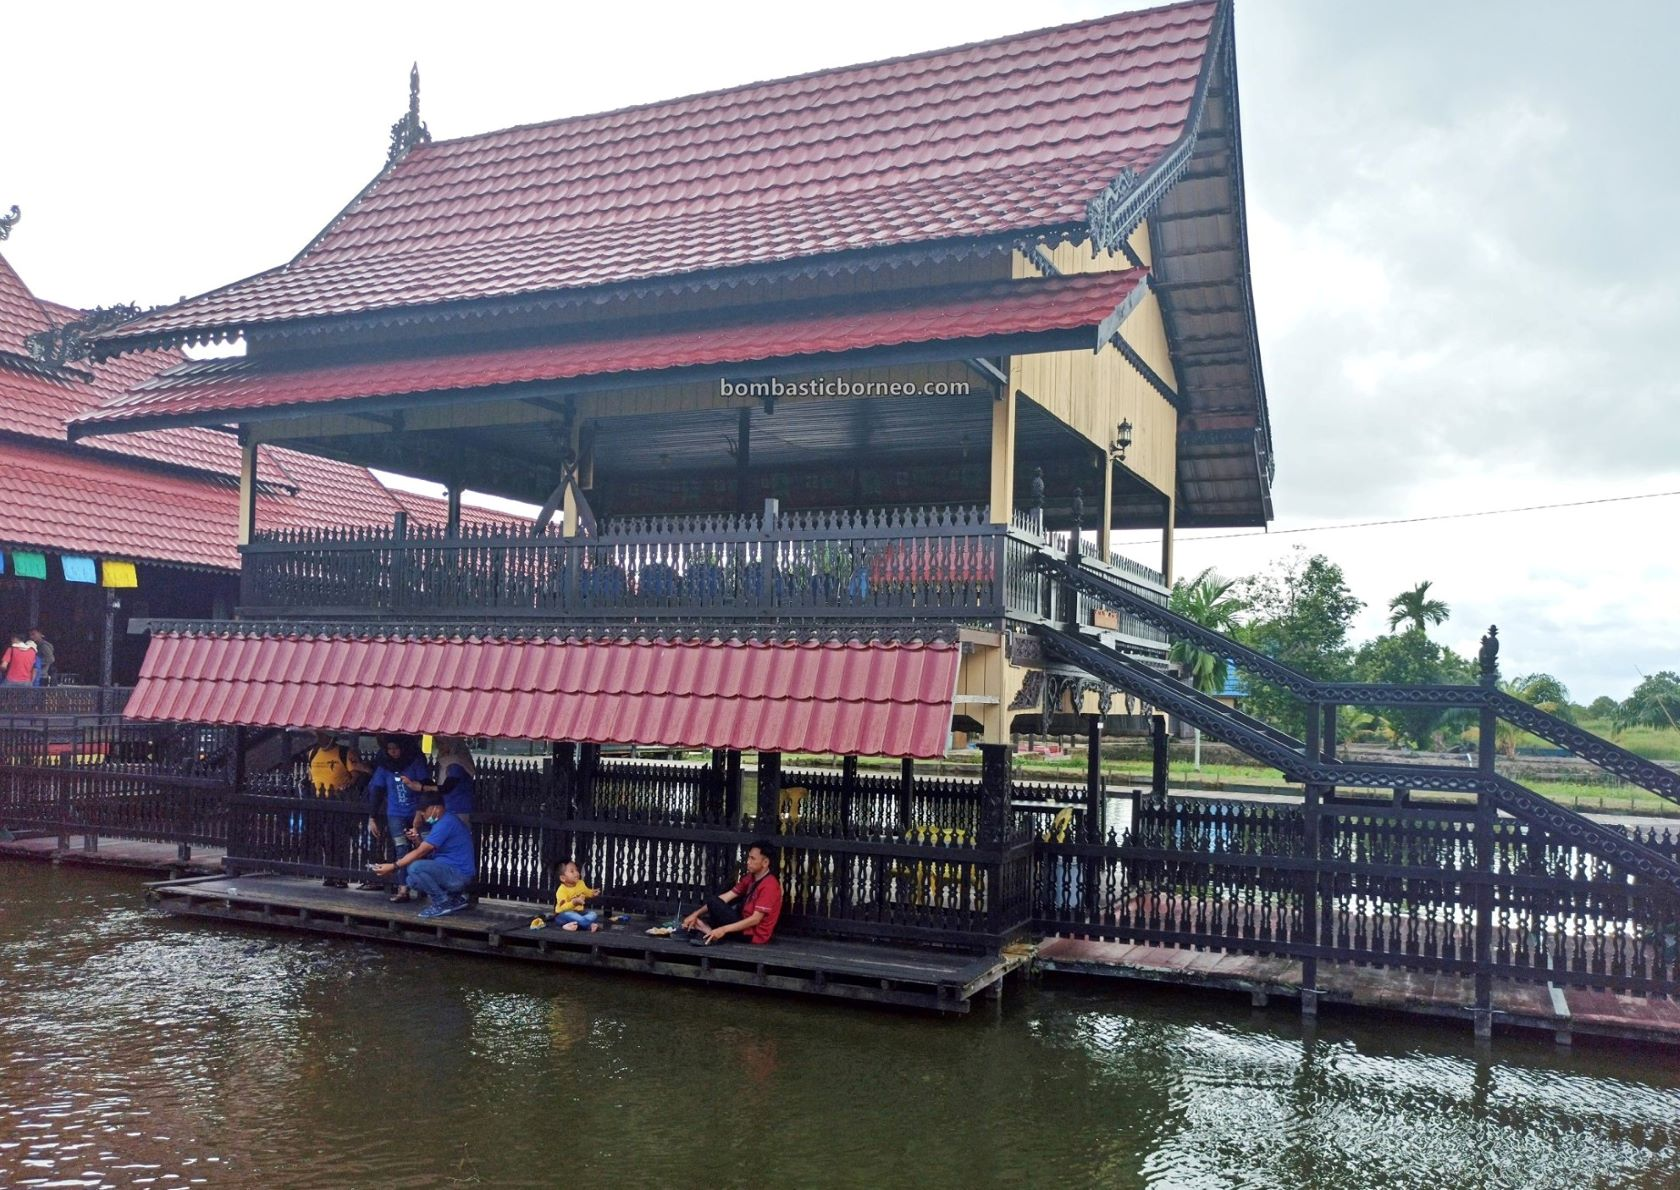 Rumah Baloy Mayo, Tidung house, Cultural Centre, authentic, traditional, native, backpackers, destination, Indonesia, Kalimantan Utara, Tarakan, Pariwisata, Tourist attraction, travel guide, Borneo,